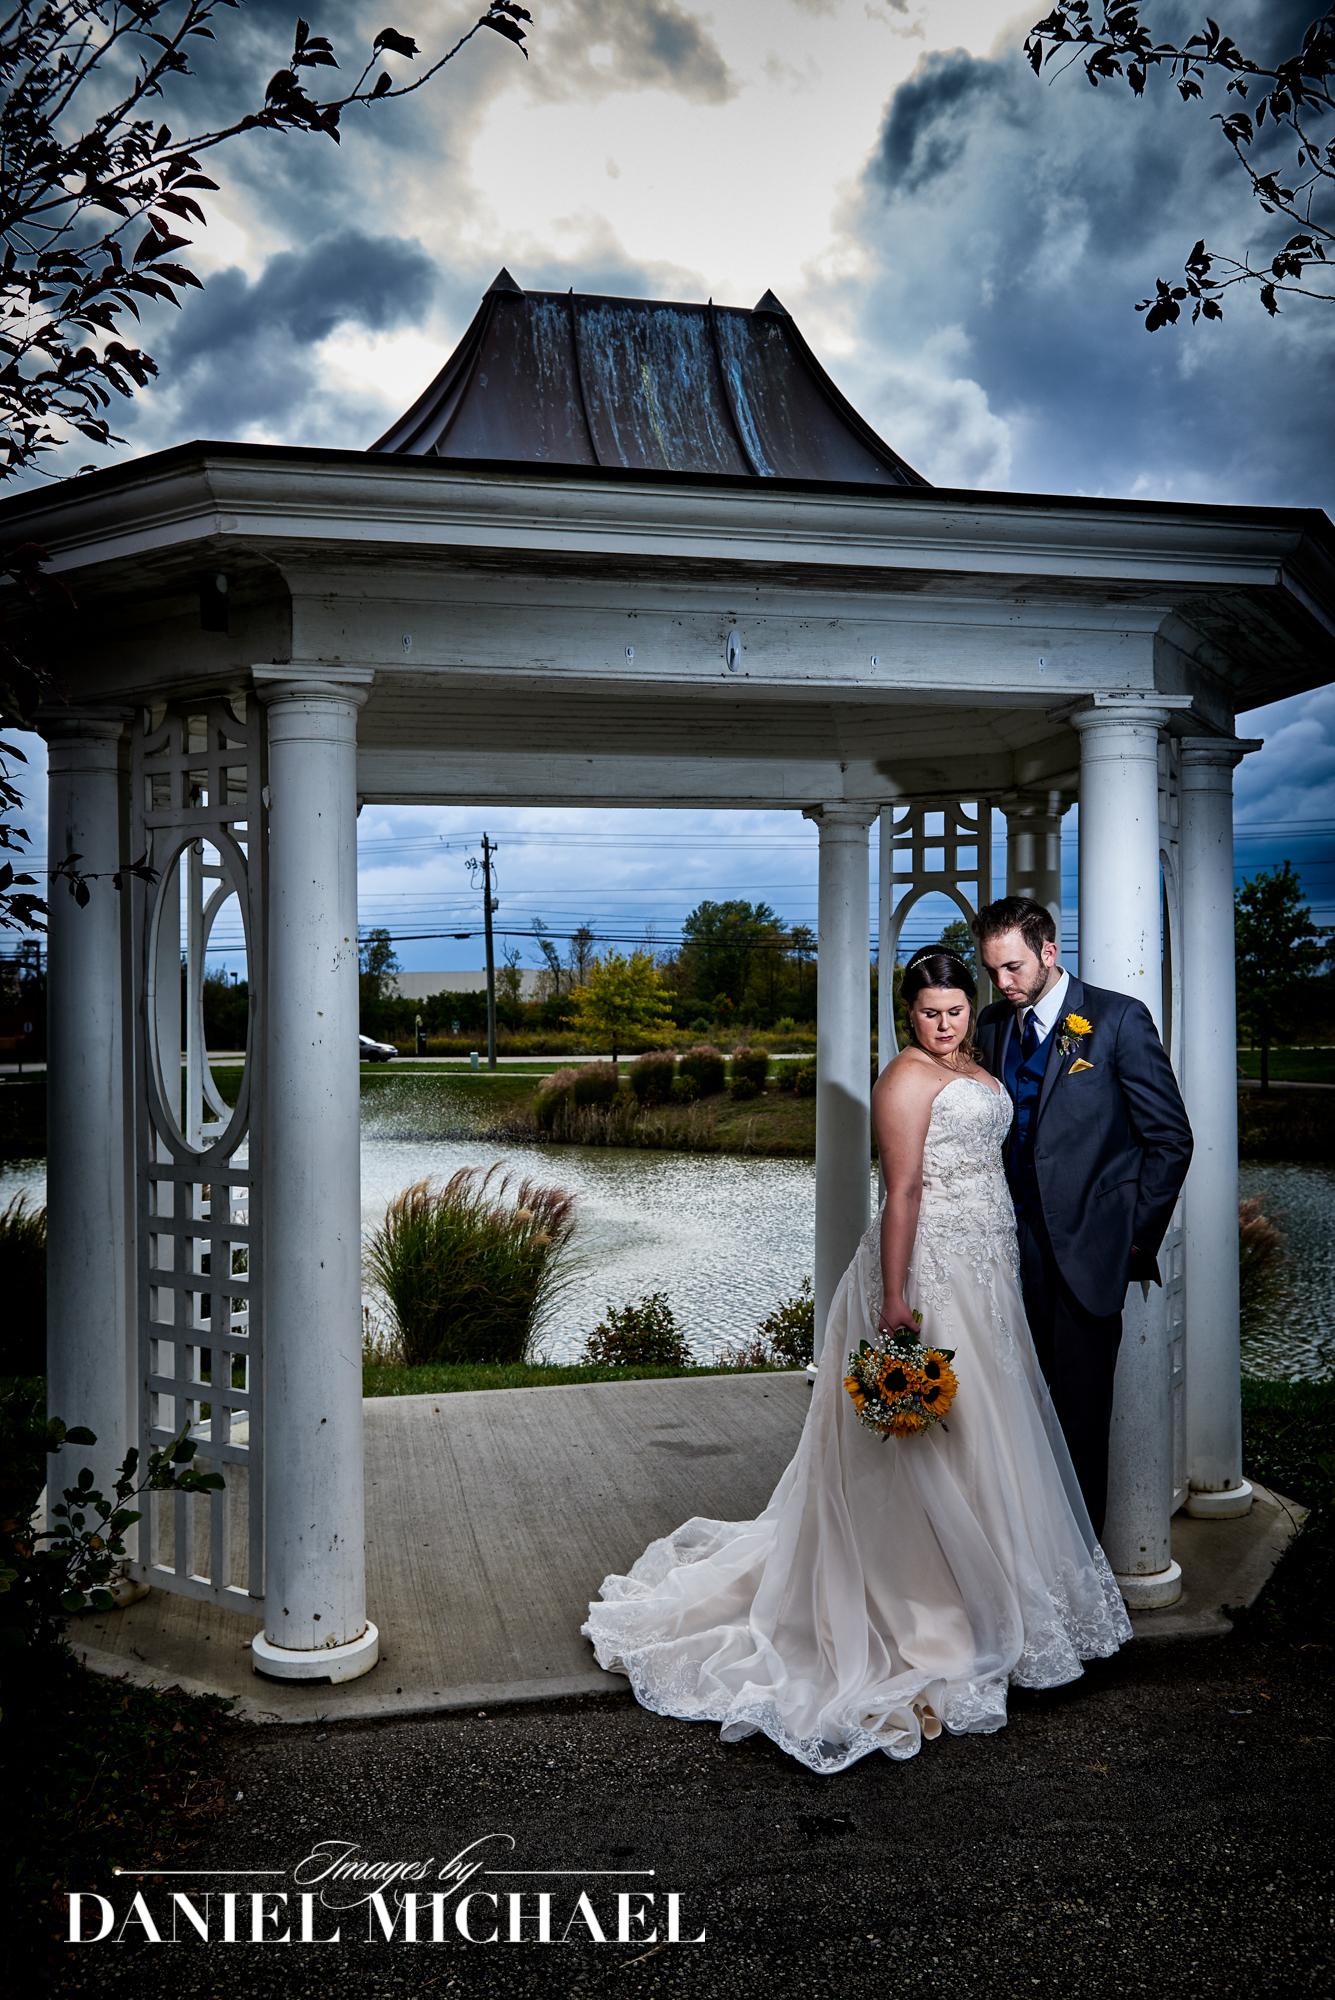 Wedding Photographers Mulhauser Barn